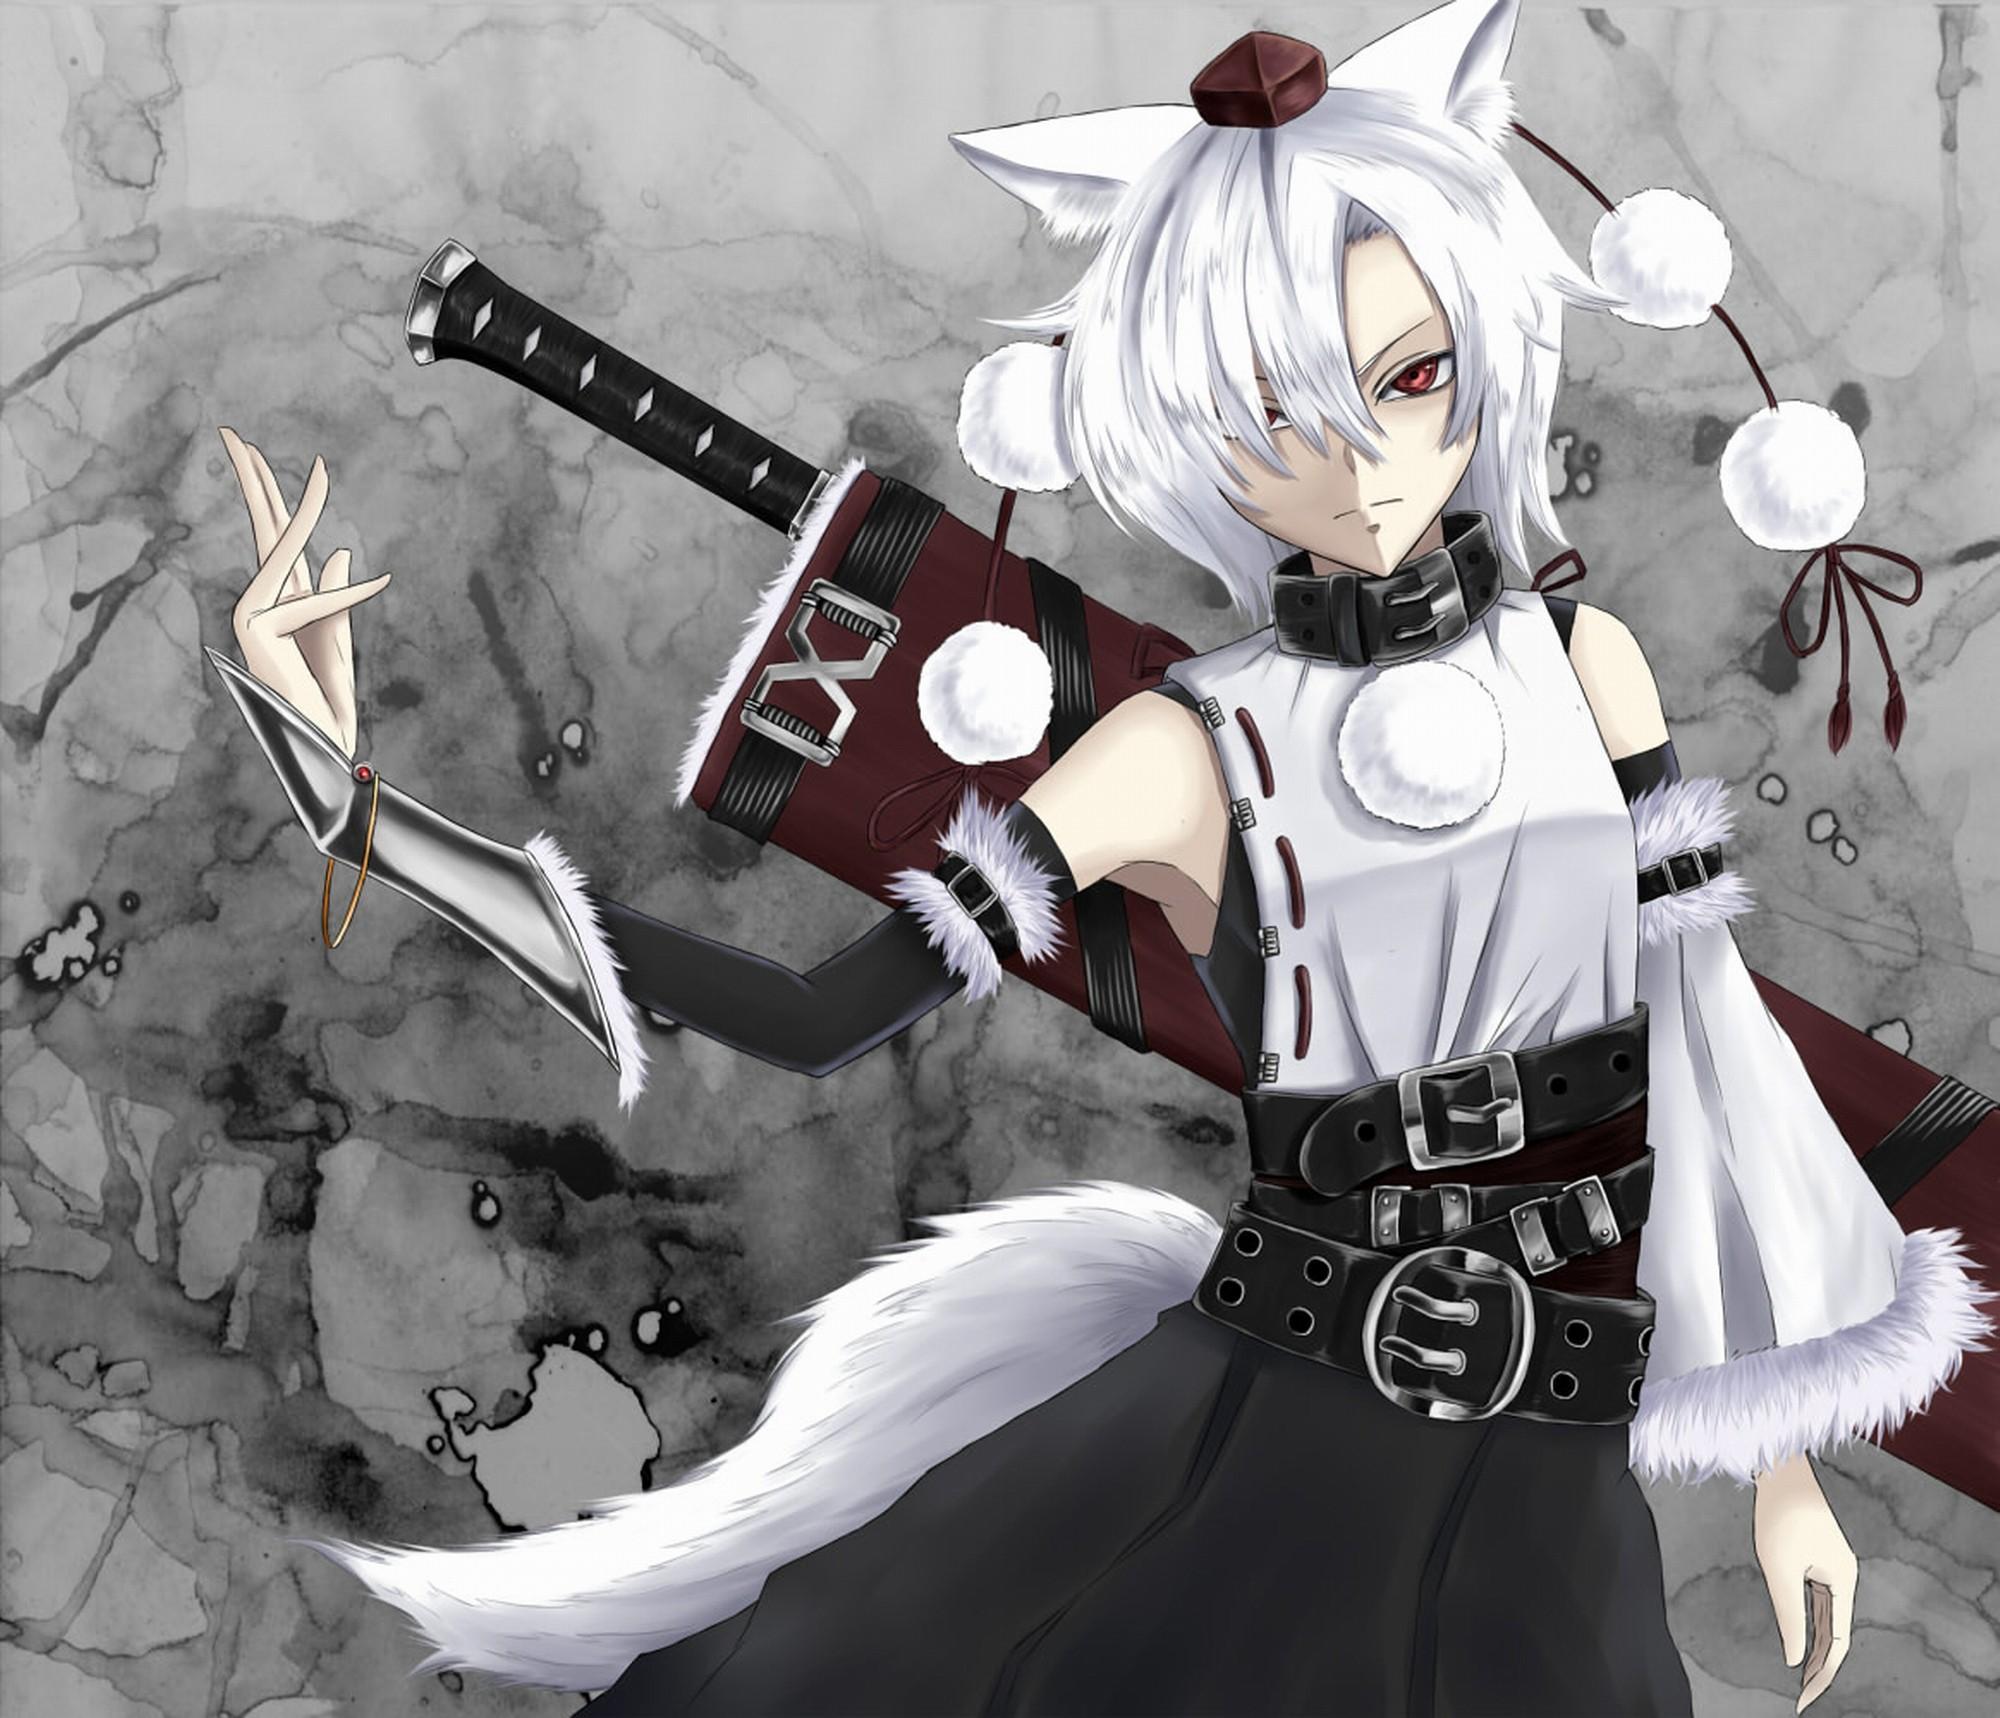 Anime Wolf Boy And Human Girl 30400 Movieweb